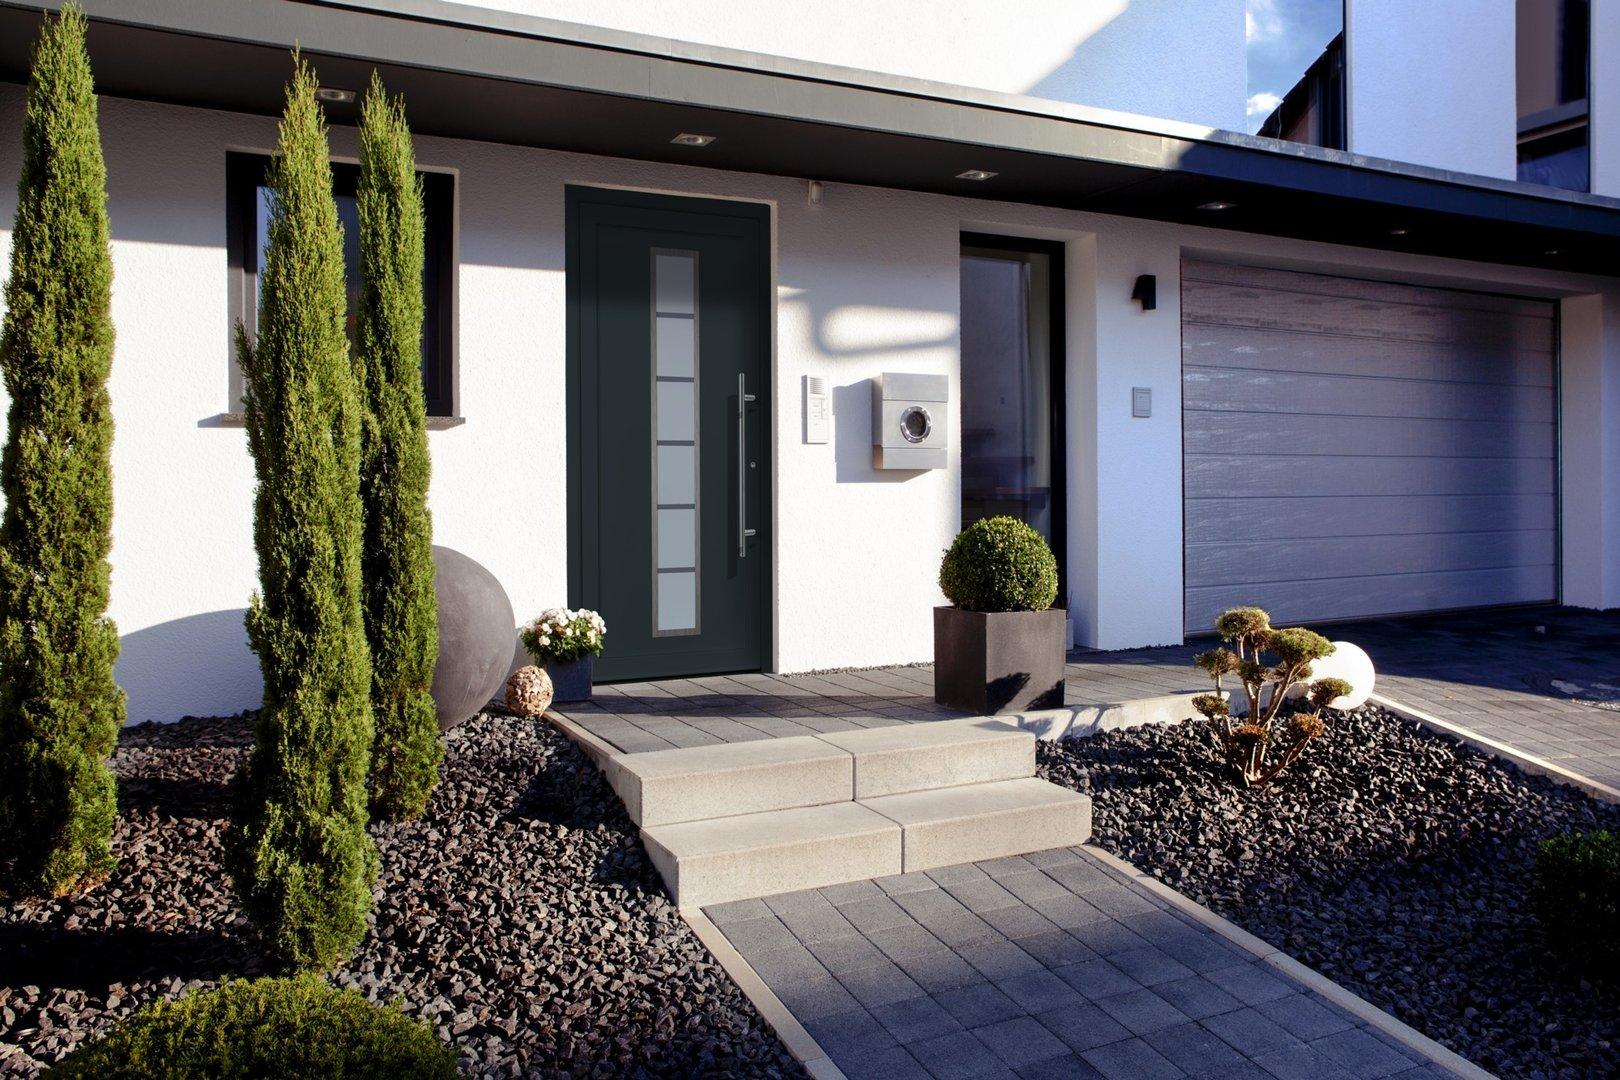 zweifarbig f r aluminium haust re einbruchhemmend. Black Bedroom Furniture Sets. Home Design Ideas